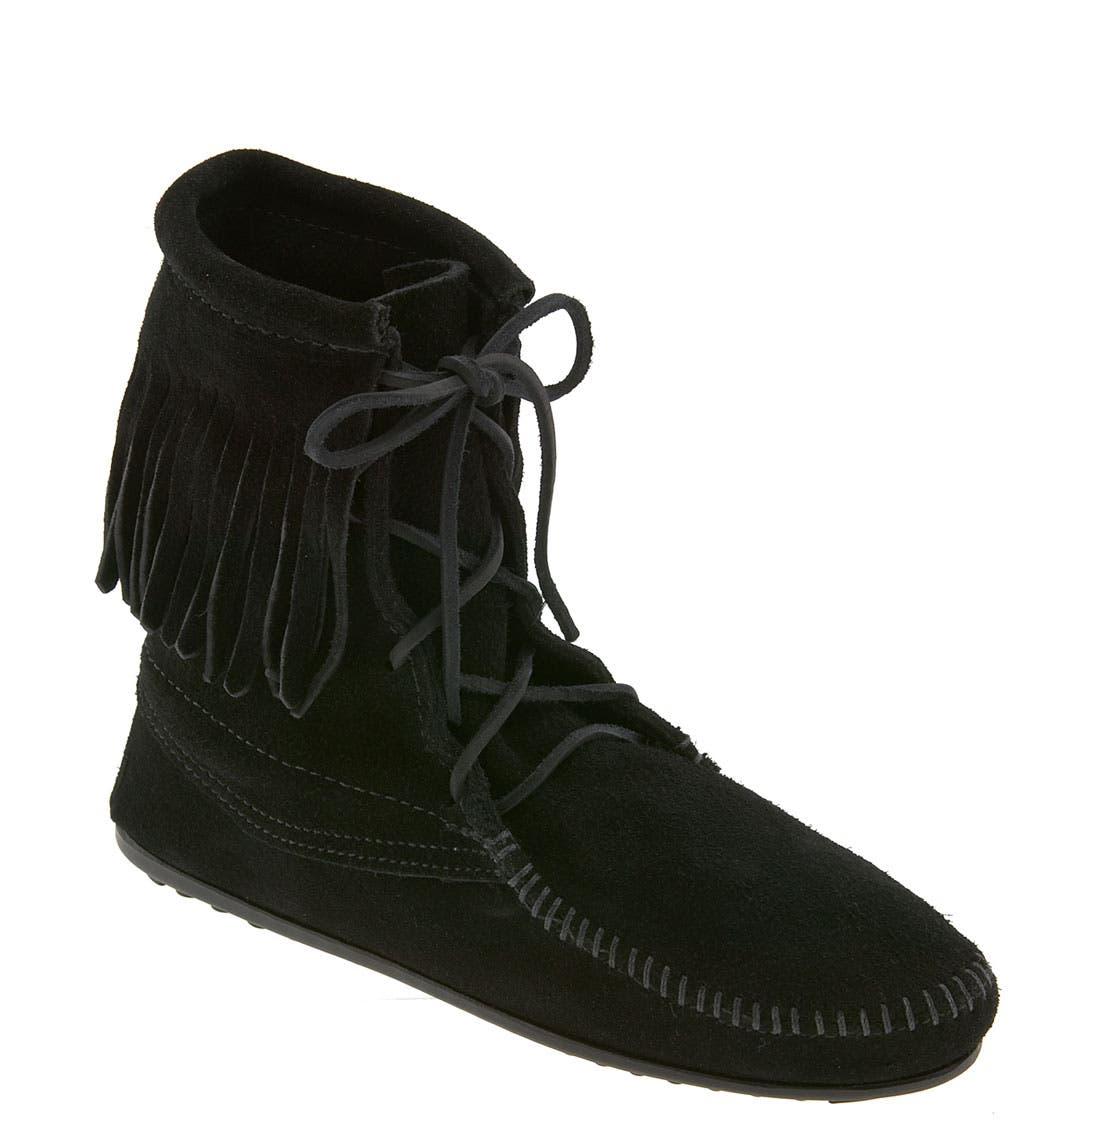 Main Image - Minnetonka 'Tramper' Boot